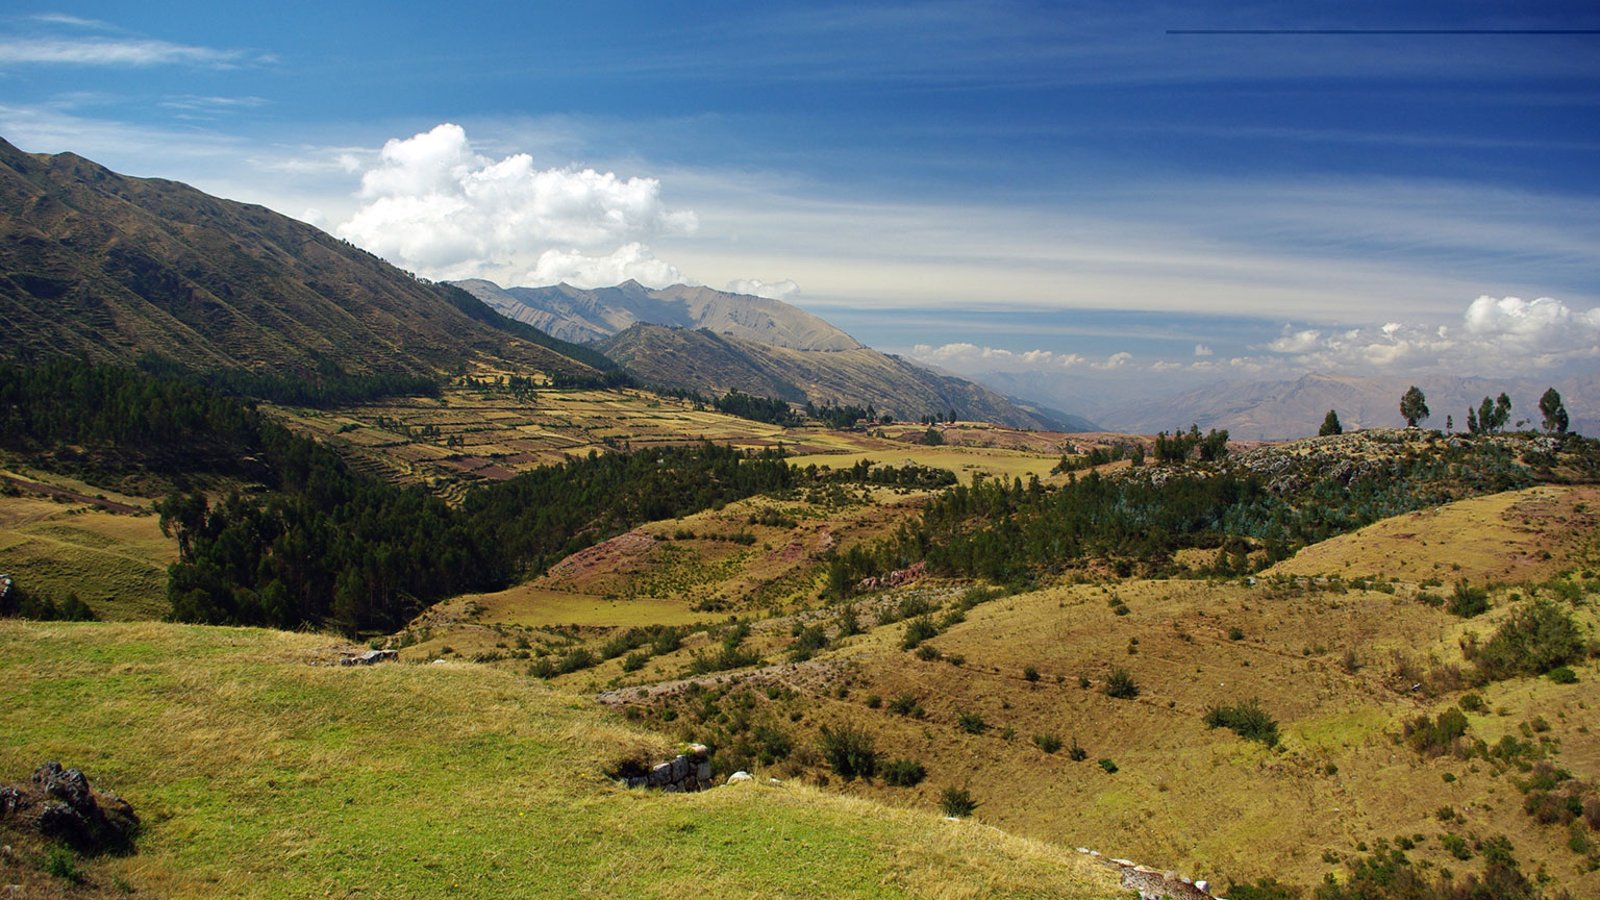 The Inca Origins—Mythology v. Archaeology